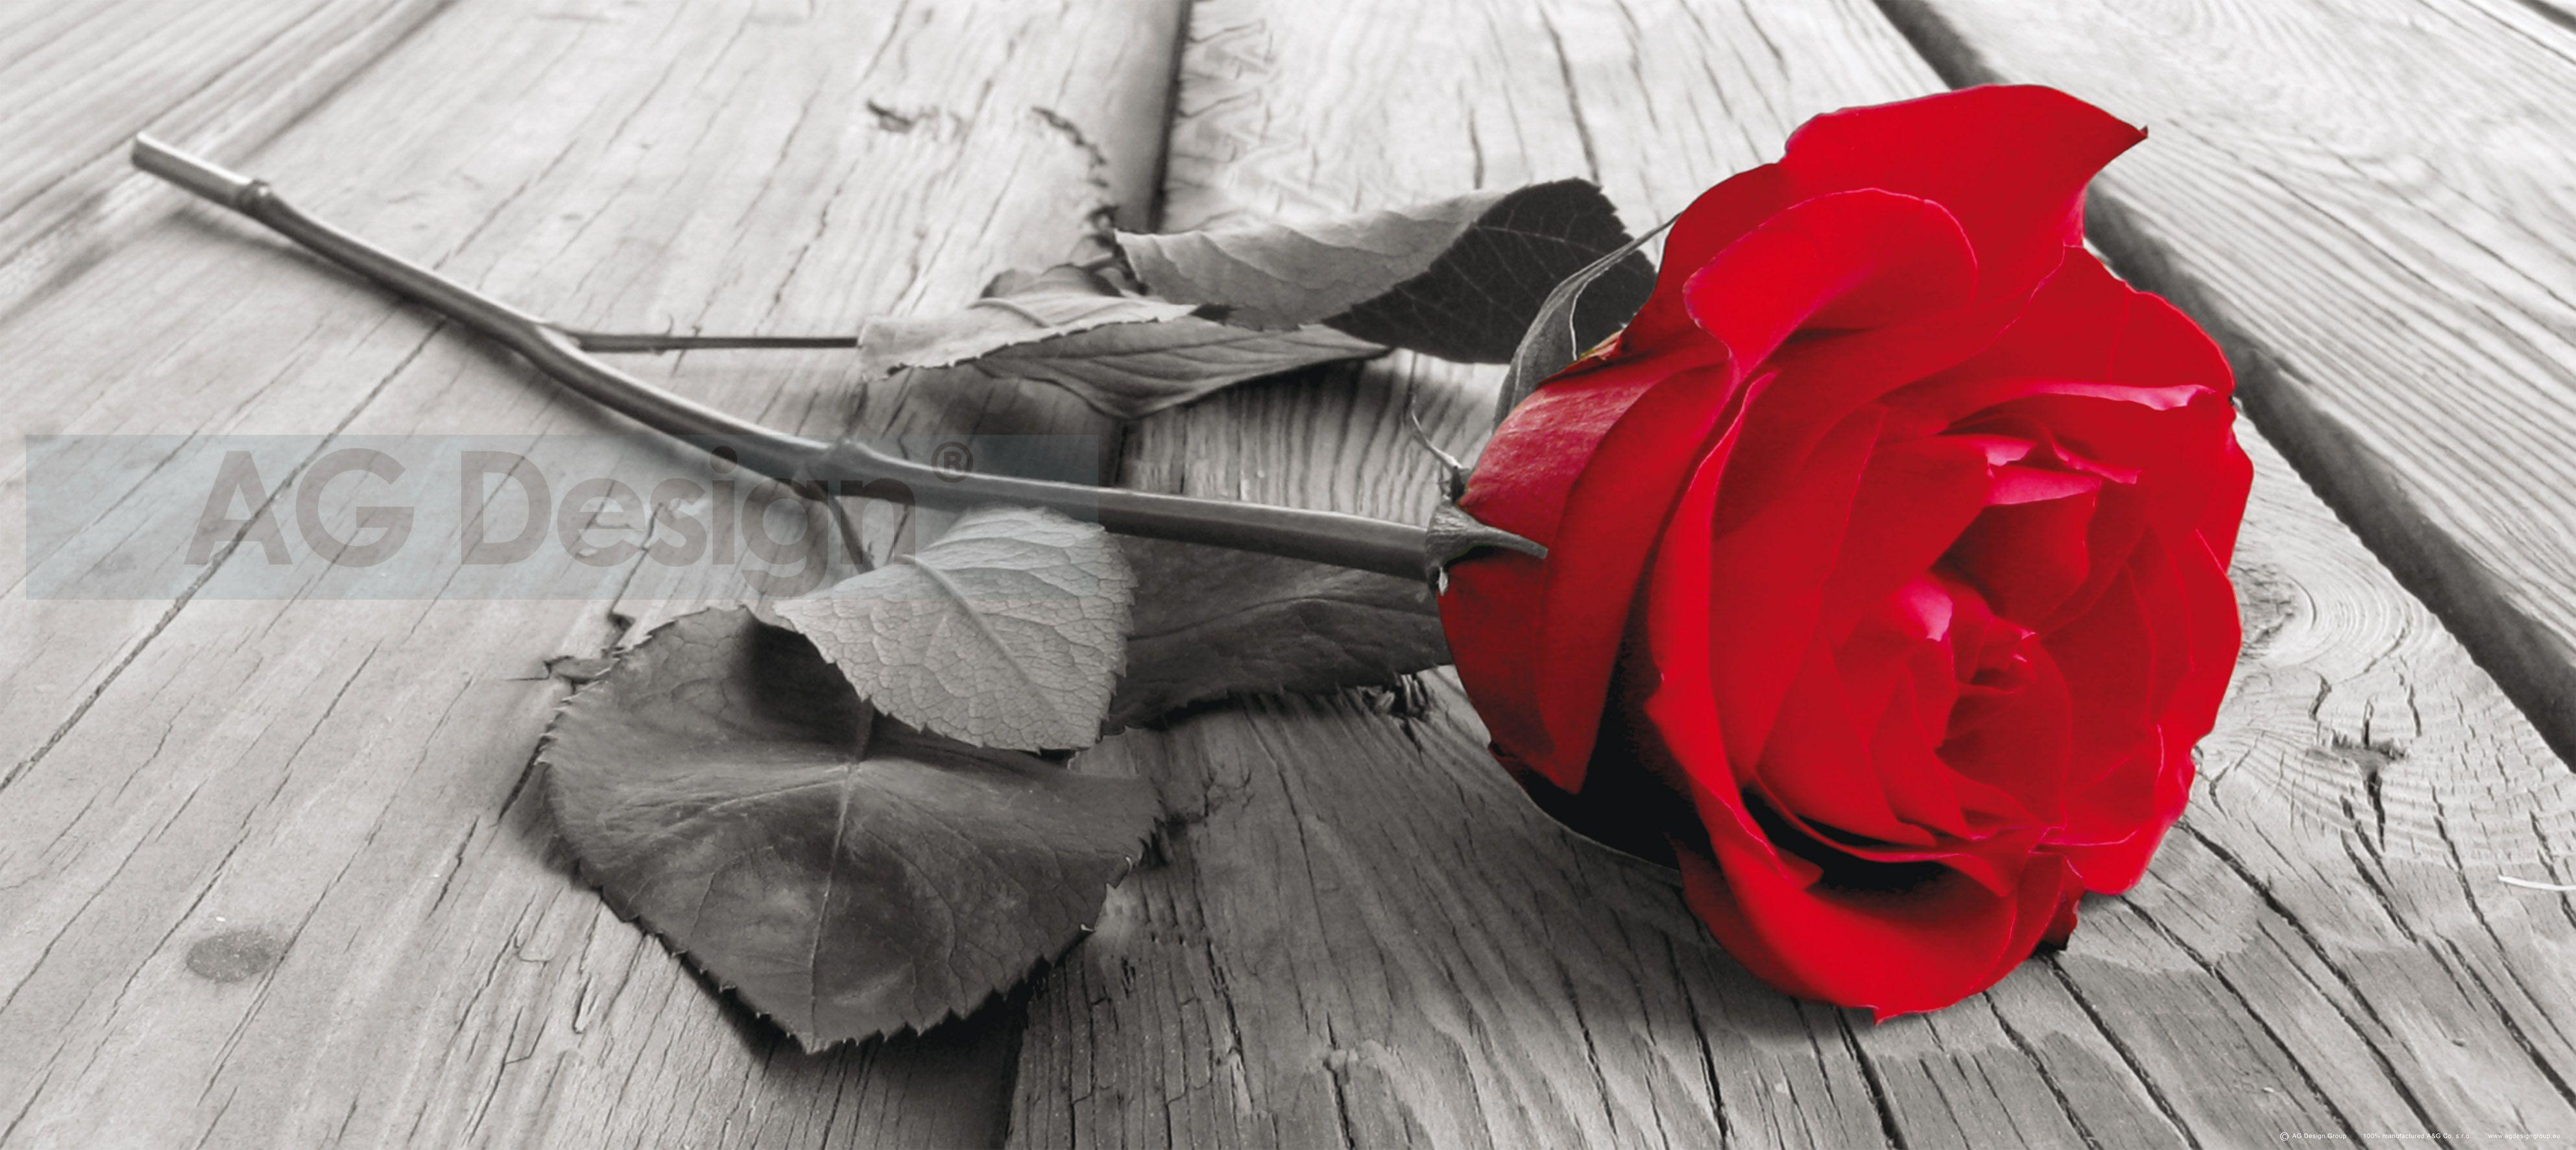 Fototapeta jednodílná - červená růže